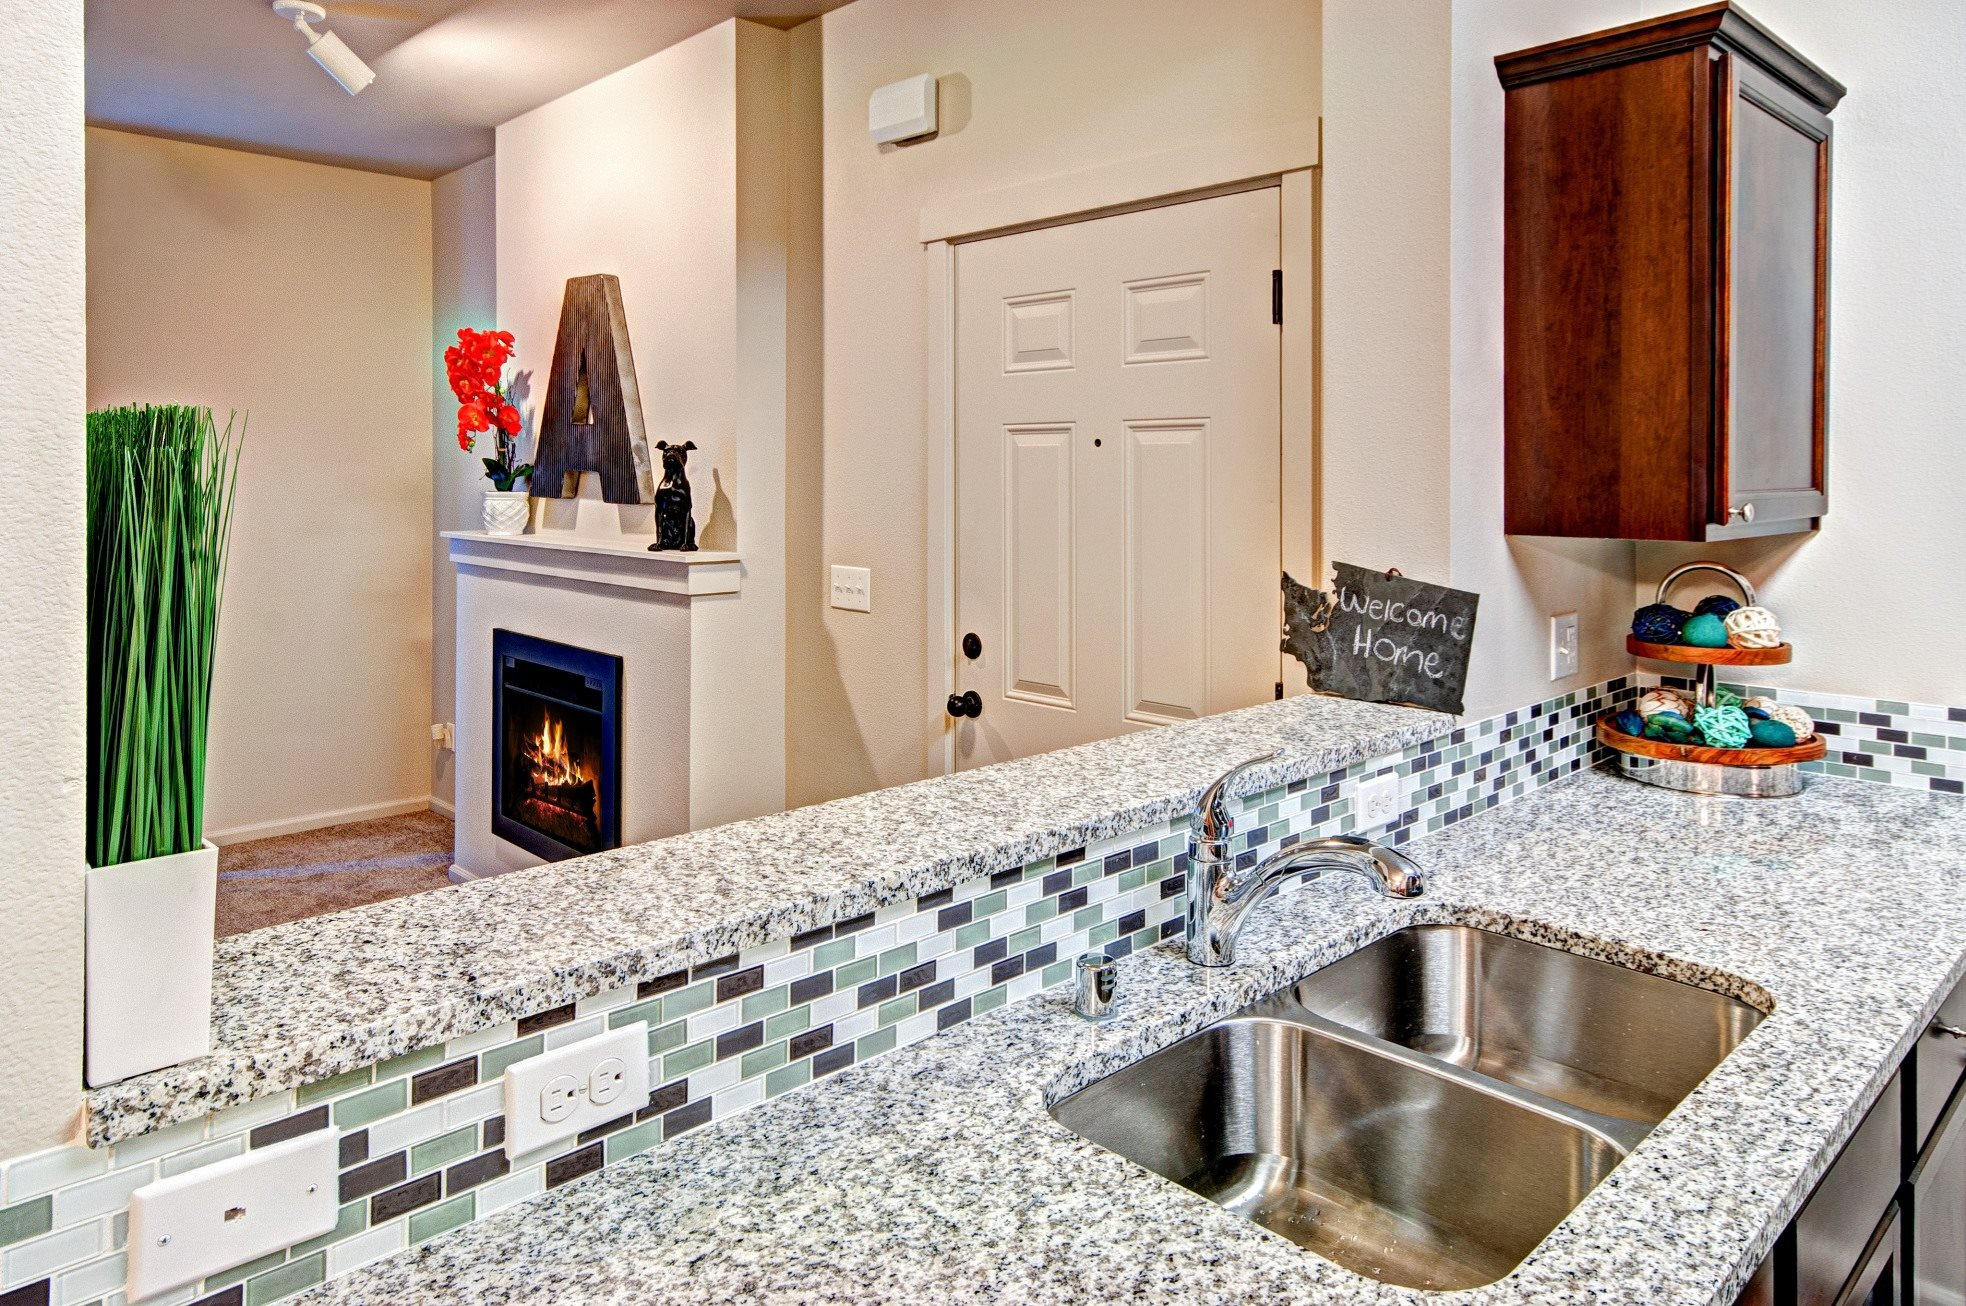 Apartments in Edgewood, WA | The Arbors at Edgewood Apartments